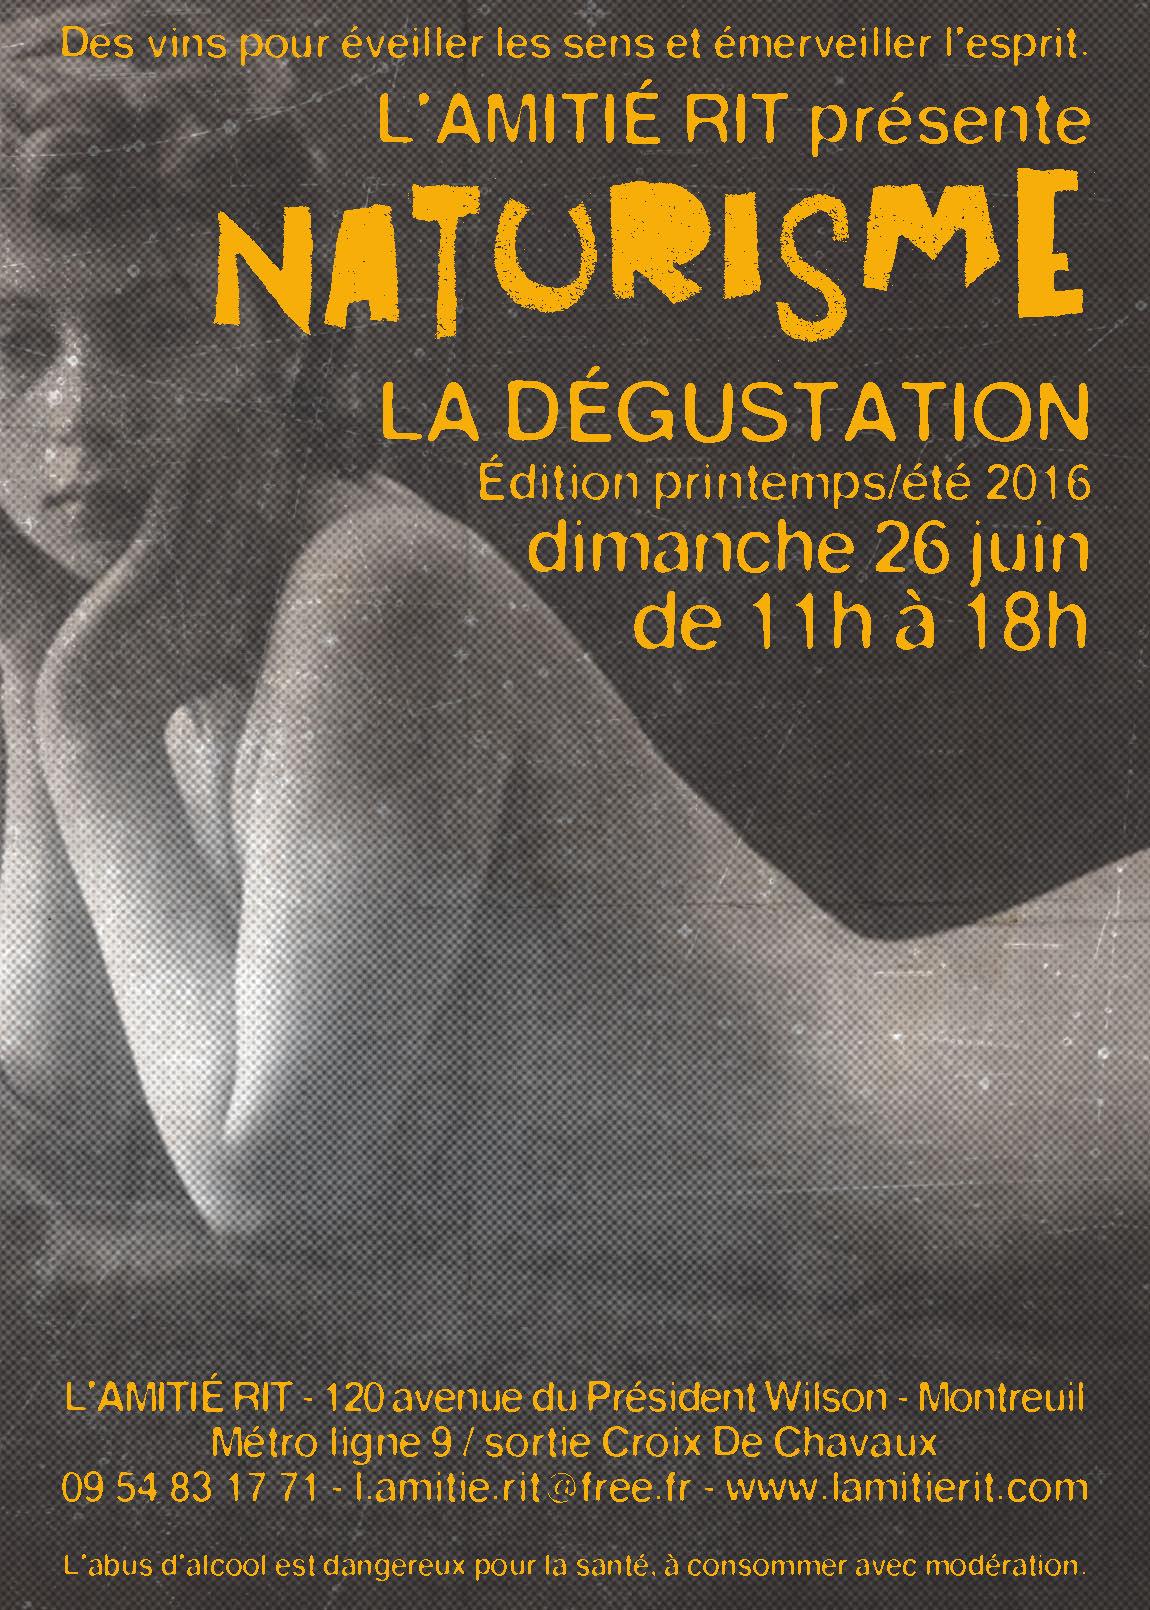 flyers recto verso naturisme  juin 16comw_Page_1